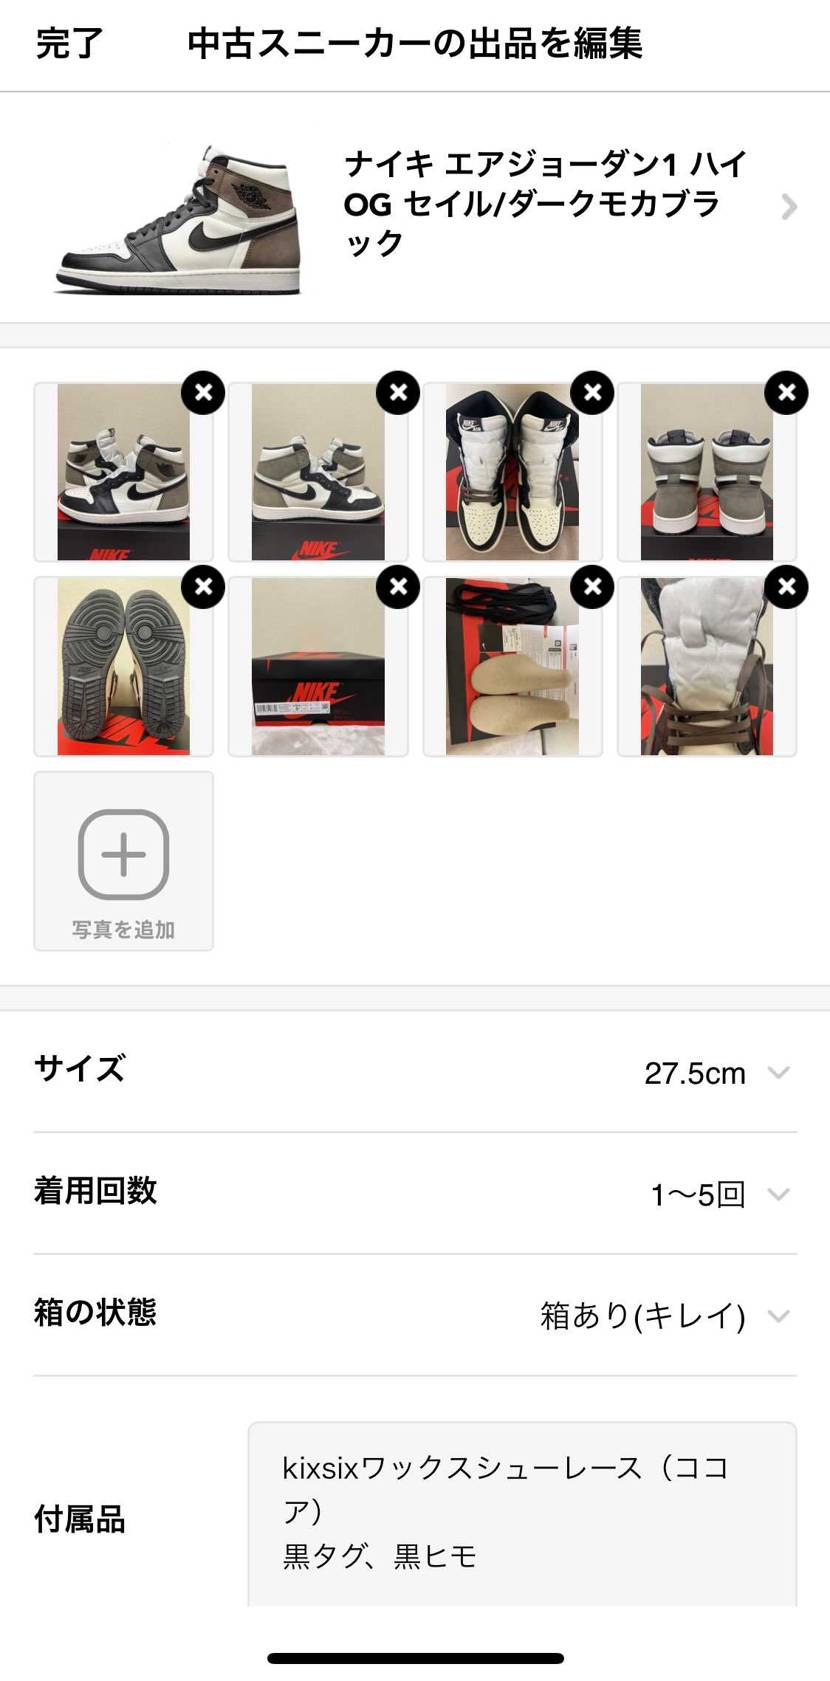 AJ1 ダークモカ 42000円で出品してます。 よろしくお願いします。